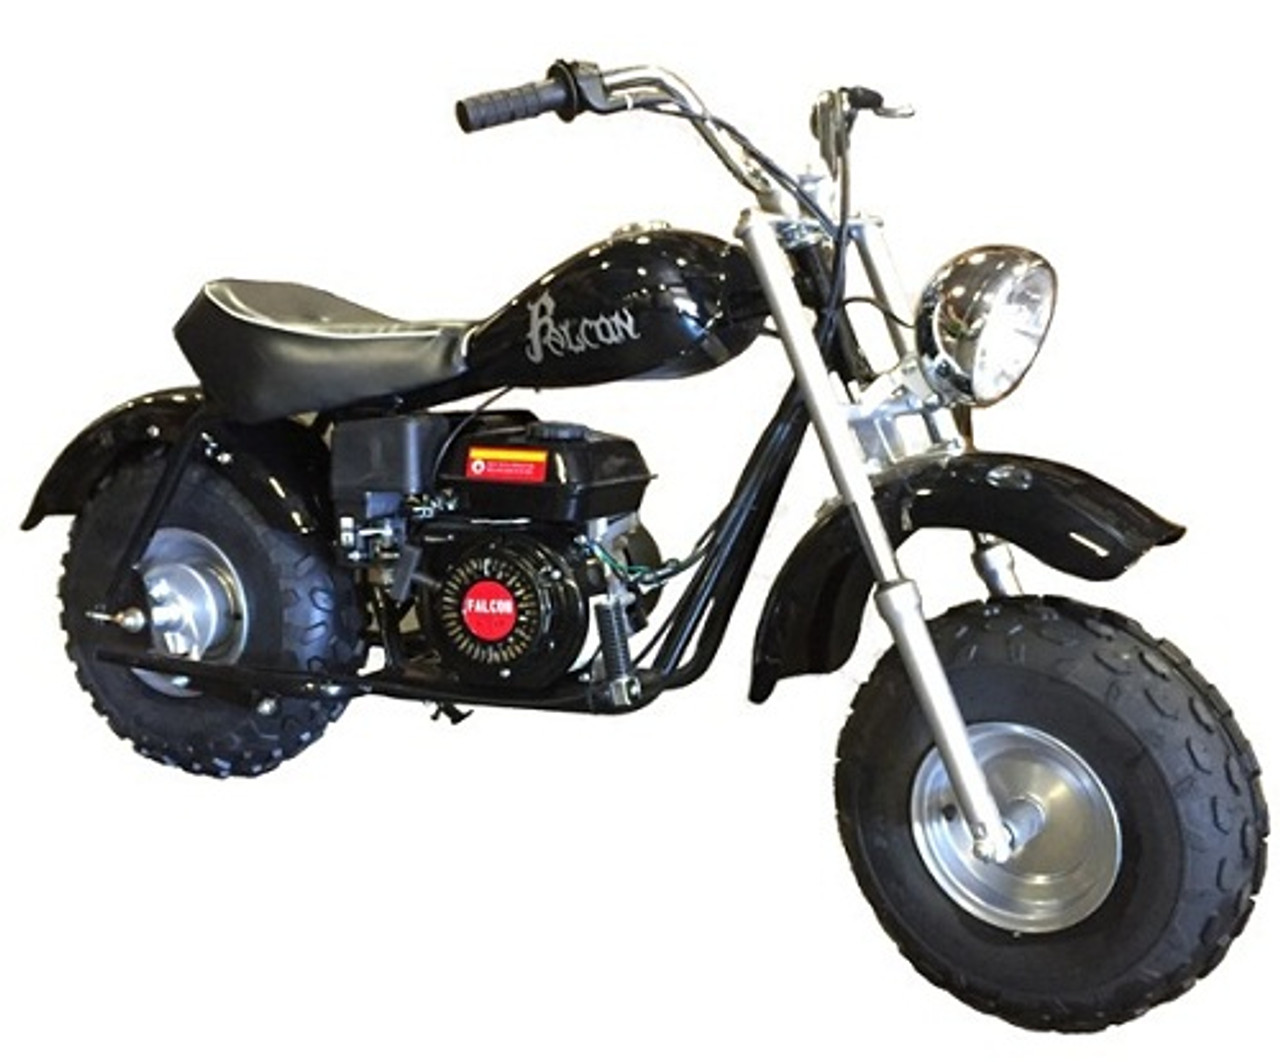 Ricky Power Sports Falcone mini bike 200cc Fully Assembled